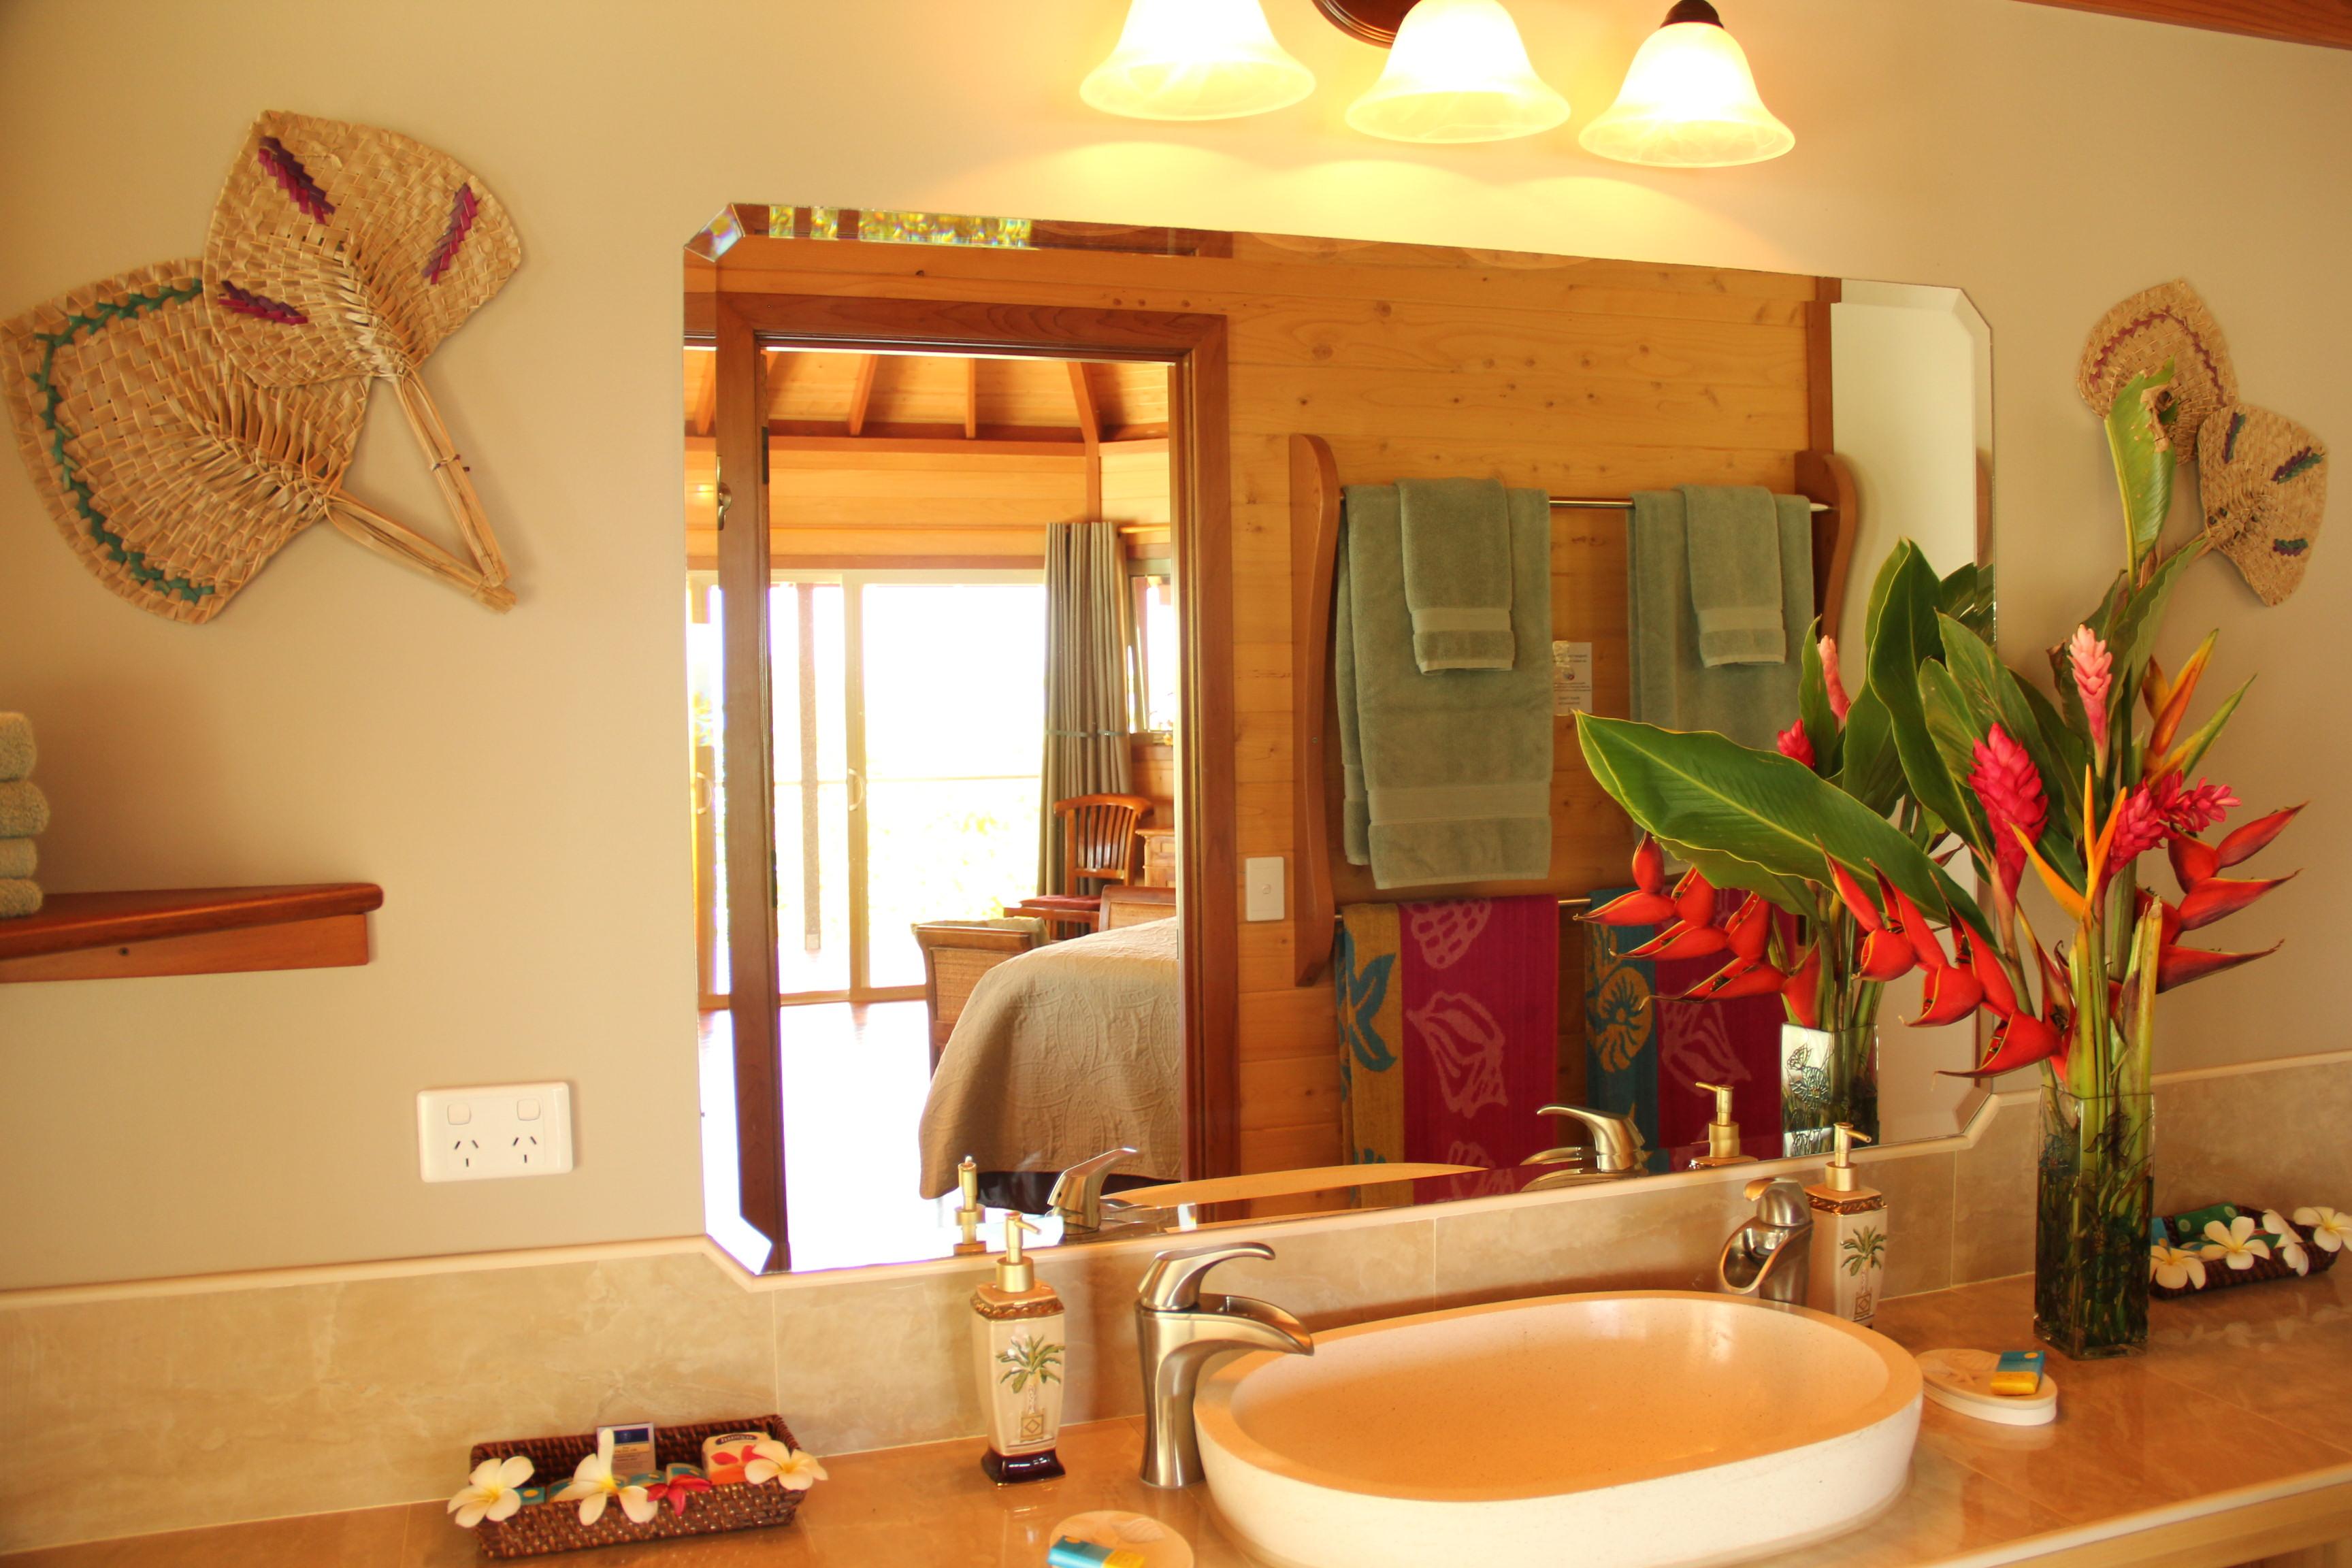 The Frangipani Bathroom Amenities